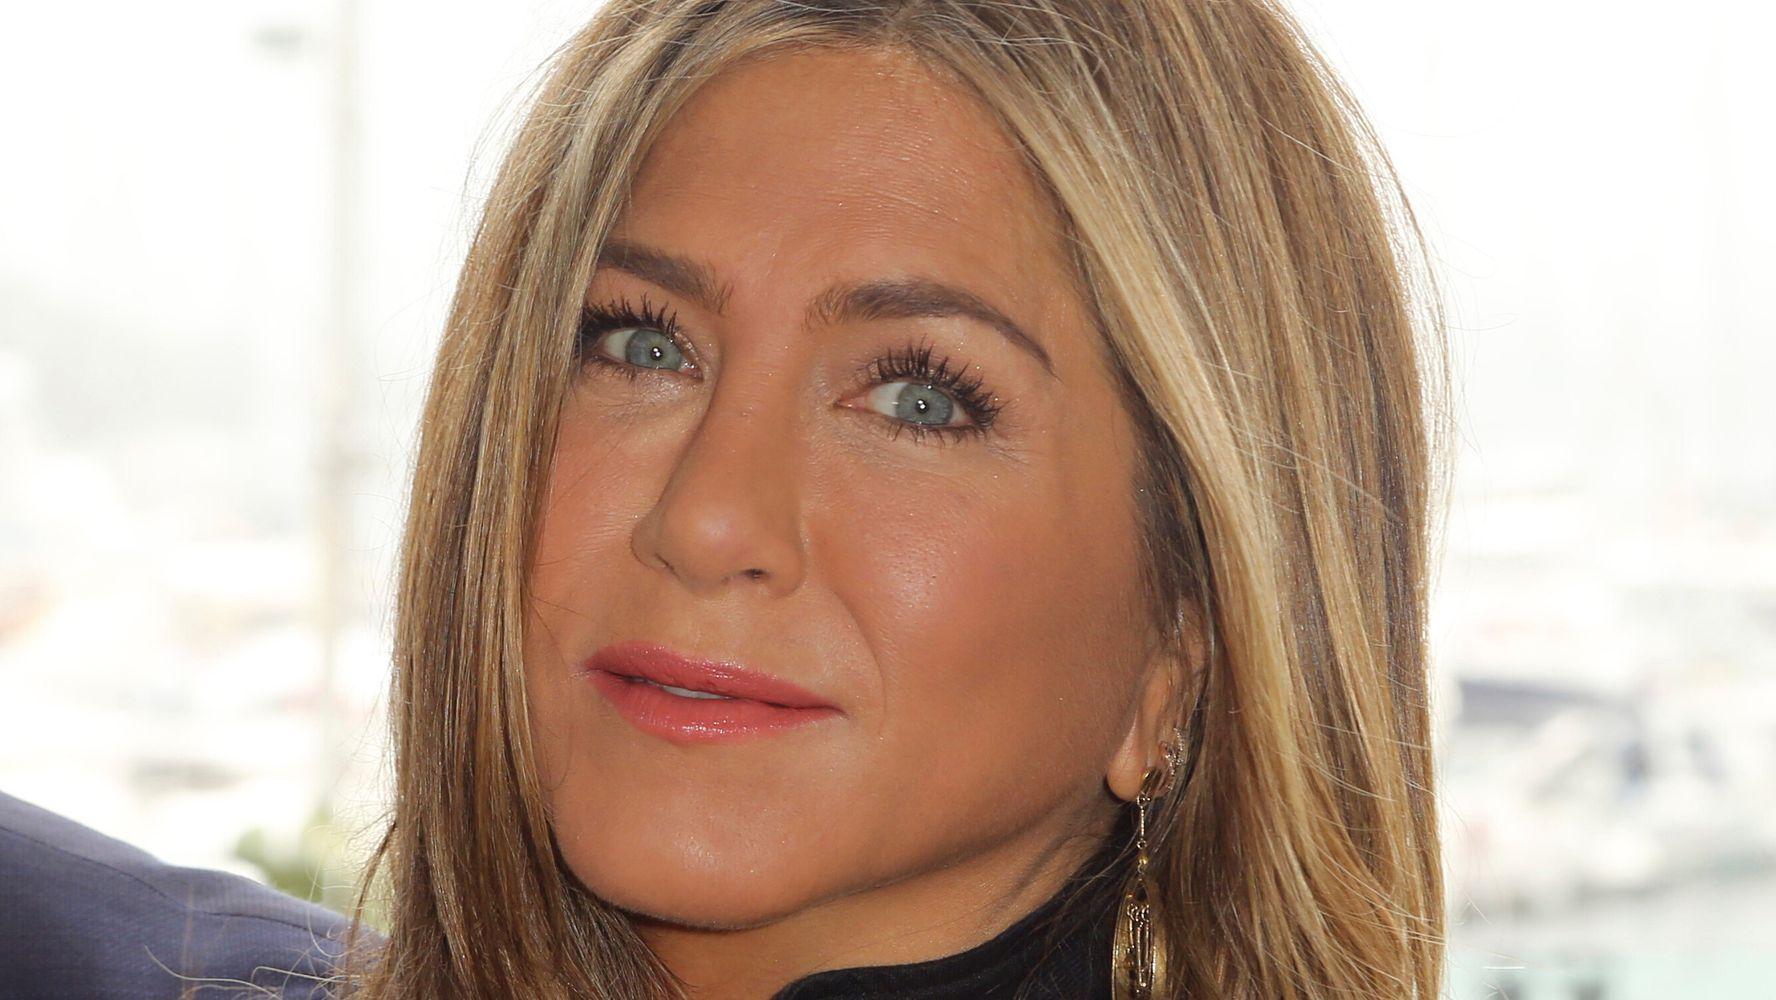 Westlake Legal Group 5d71bc3c250000901605fef4 Jennifer Aniston Reveals The Biggest Change She's Noticed Since Turning 50